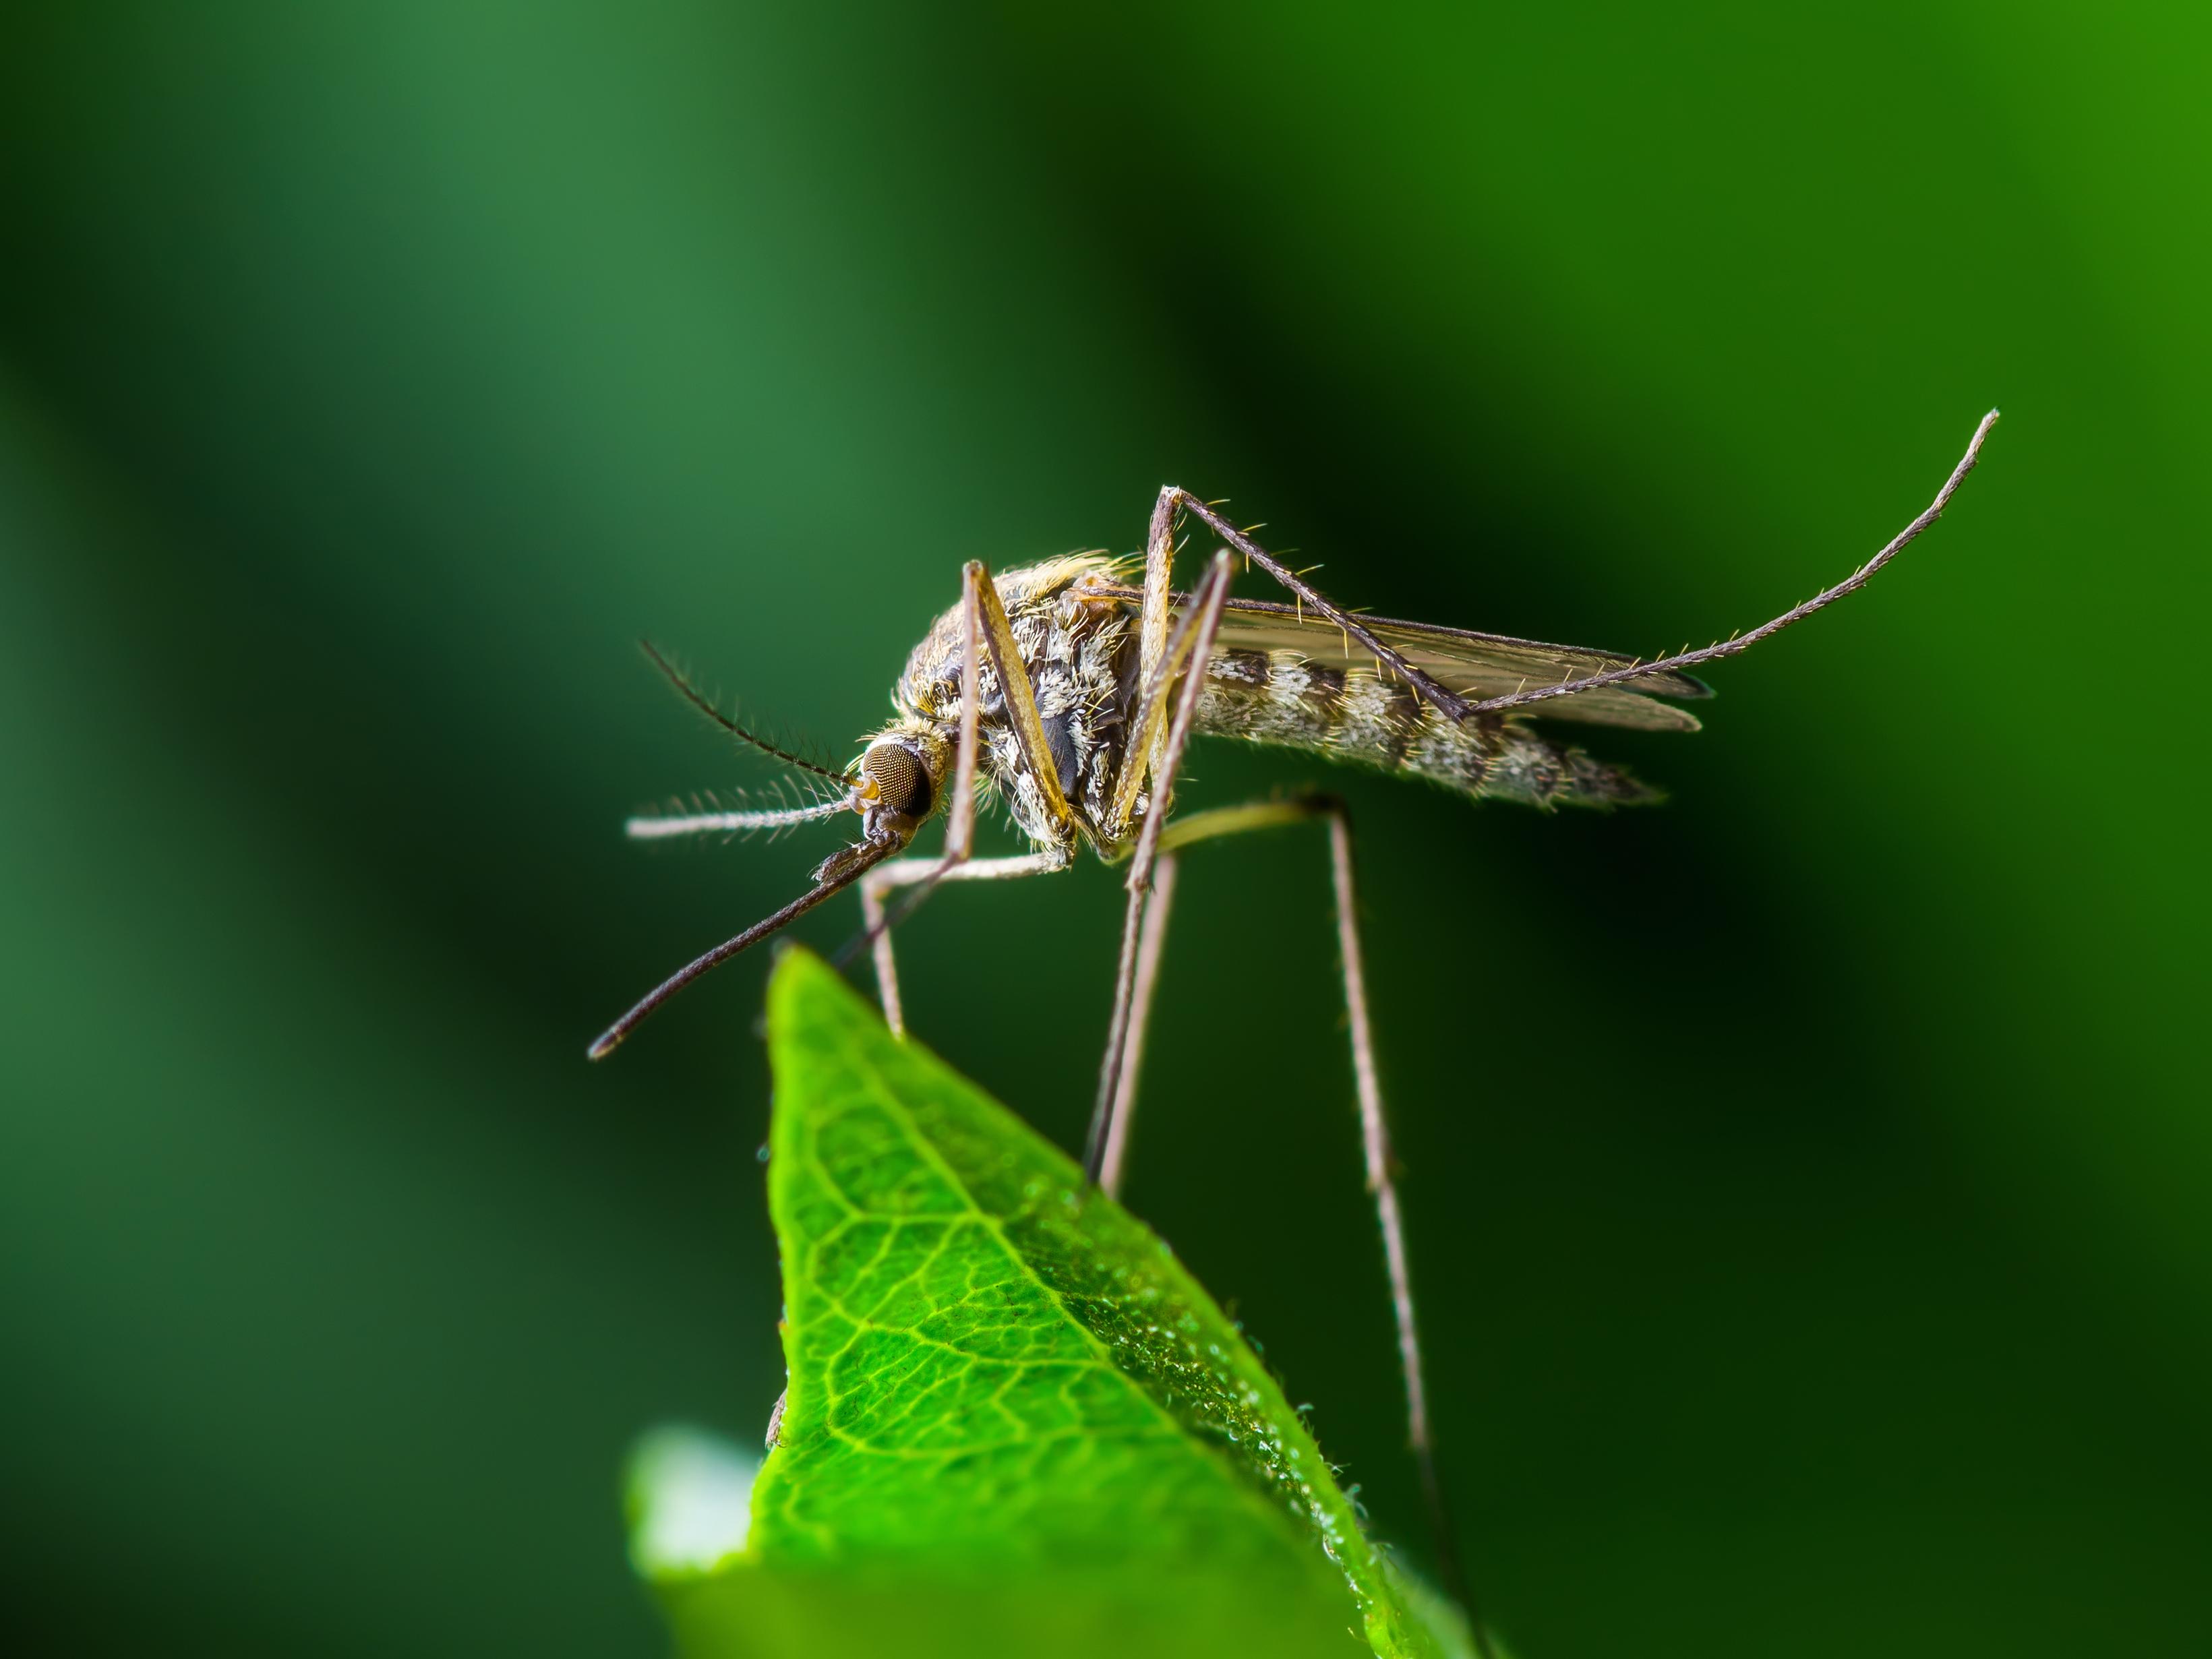 Yellow Fever Mosquito Image 03